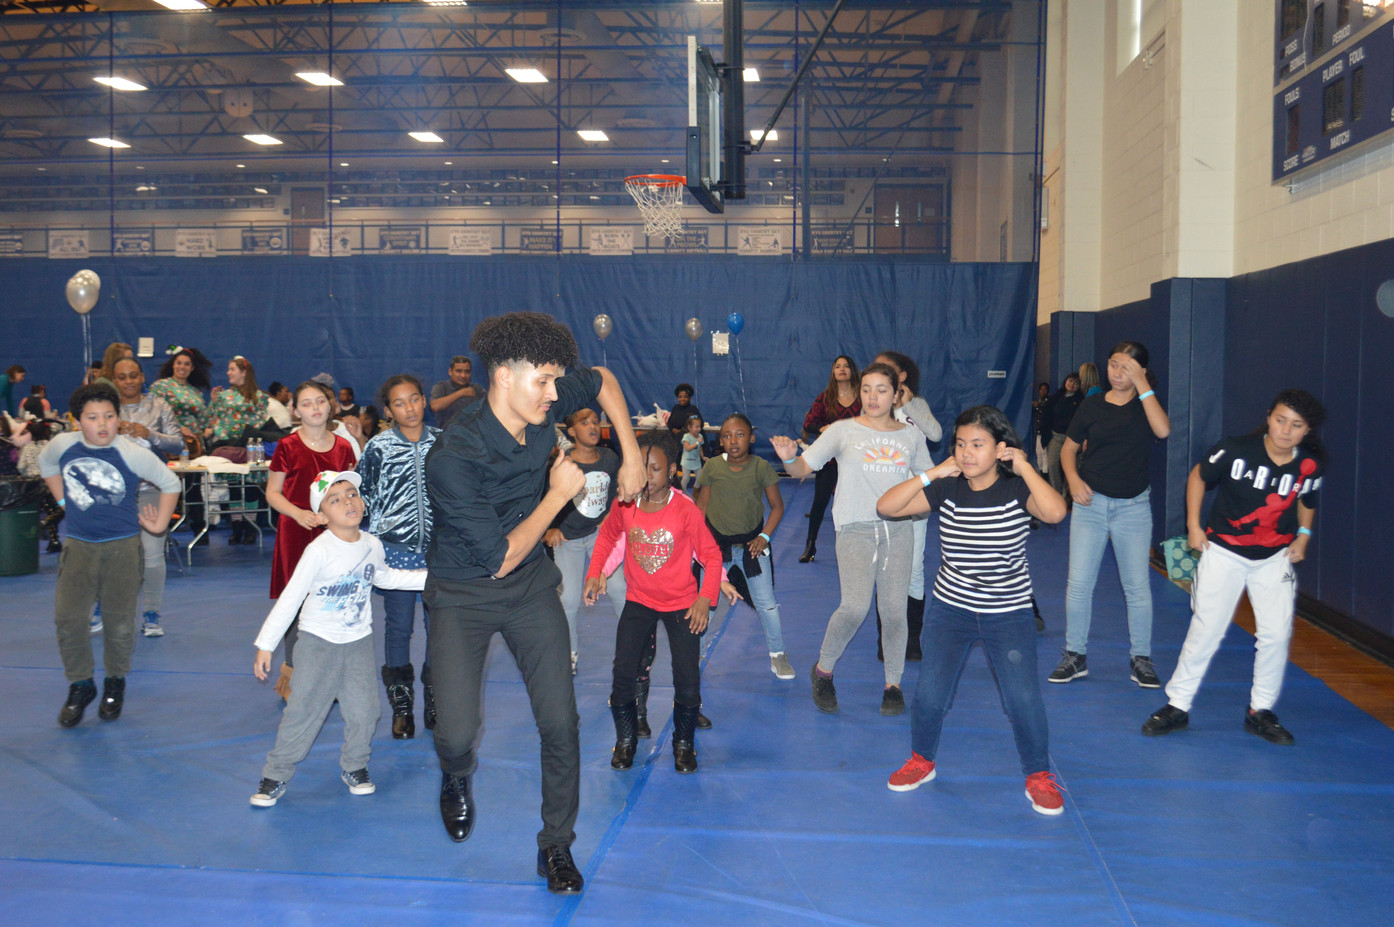 Motivational-Dancer-For-Kids-Event.JPG